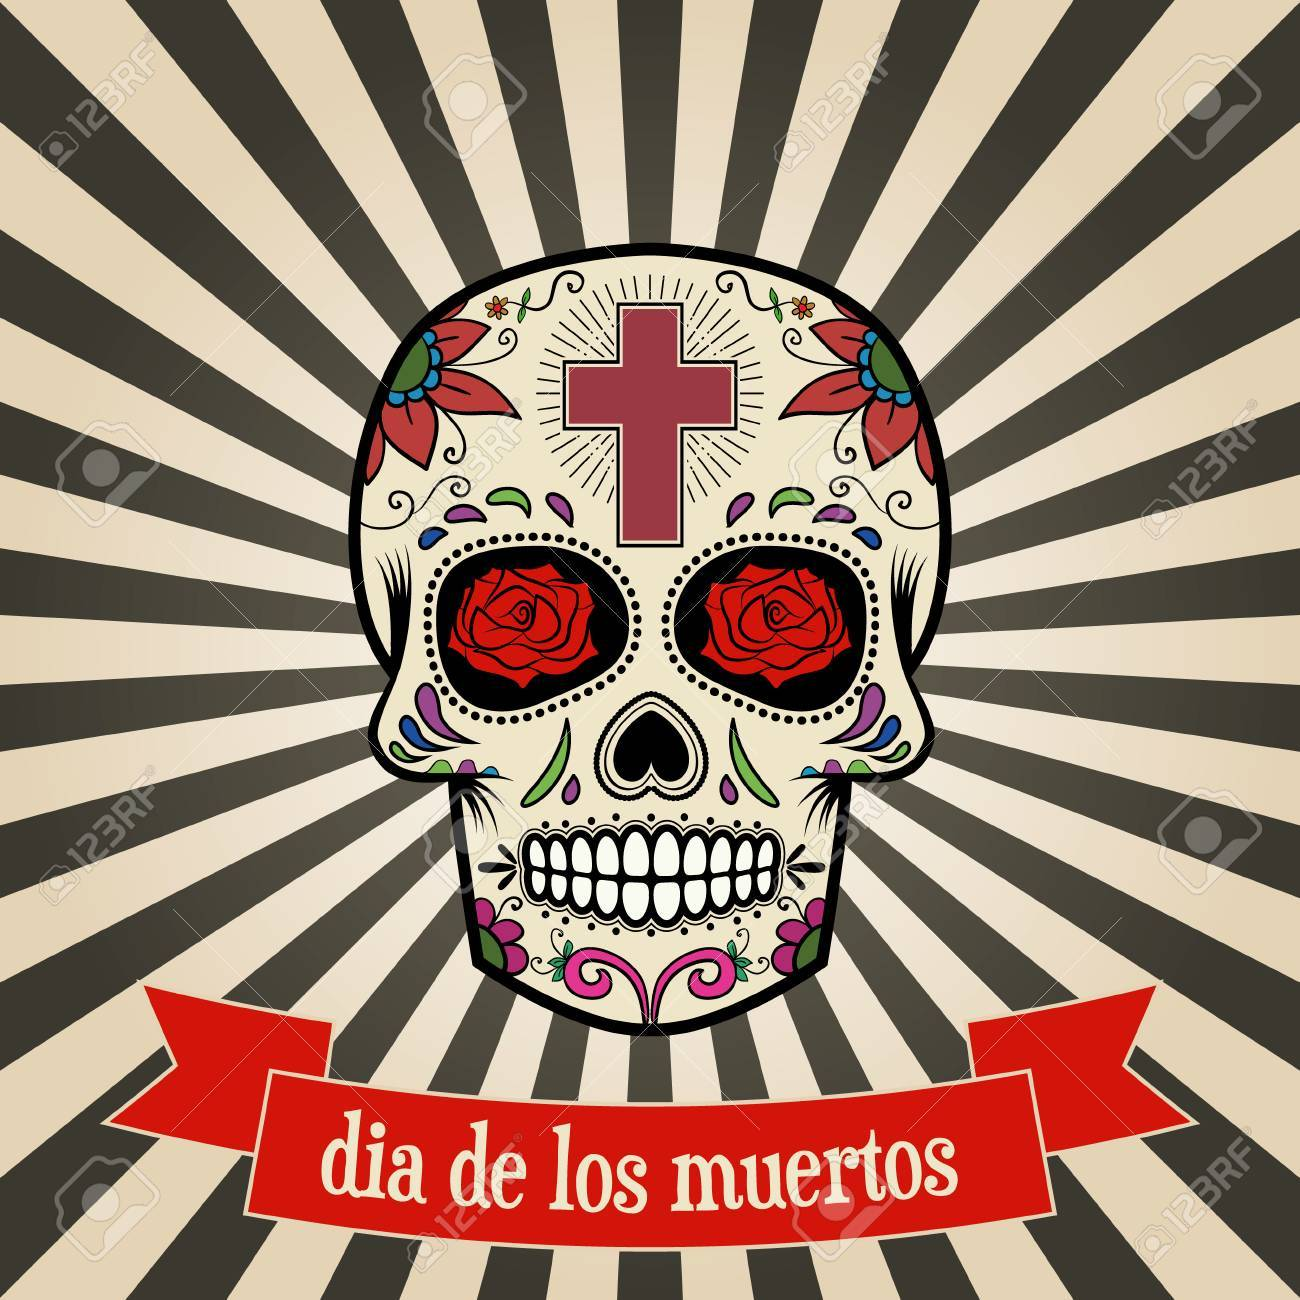 day of the dead. dia de los muertos. Sugar skull on vintage background with banner. Vector illustration. - 63464582